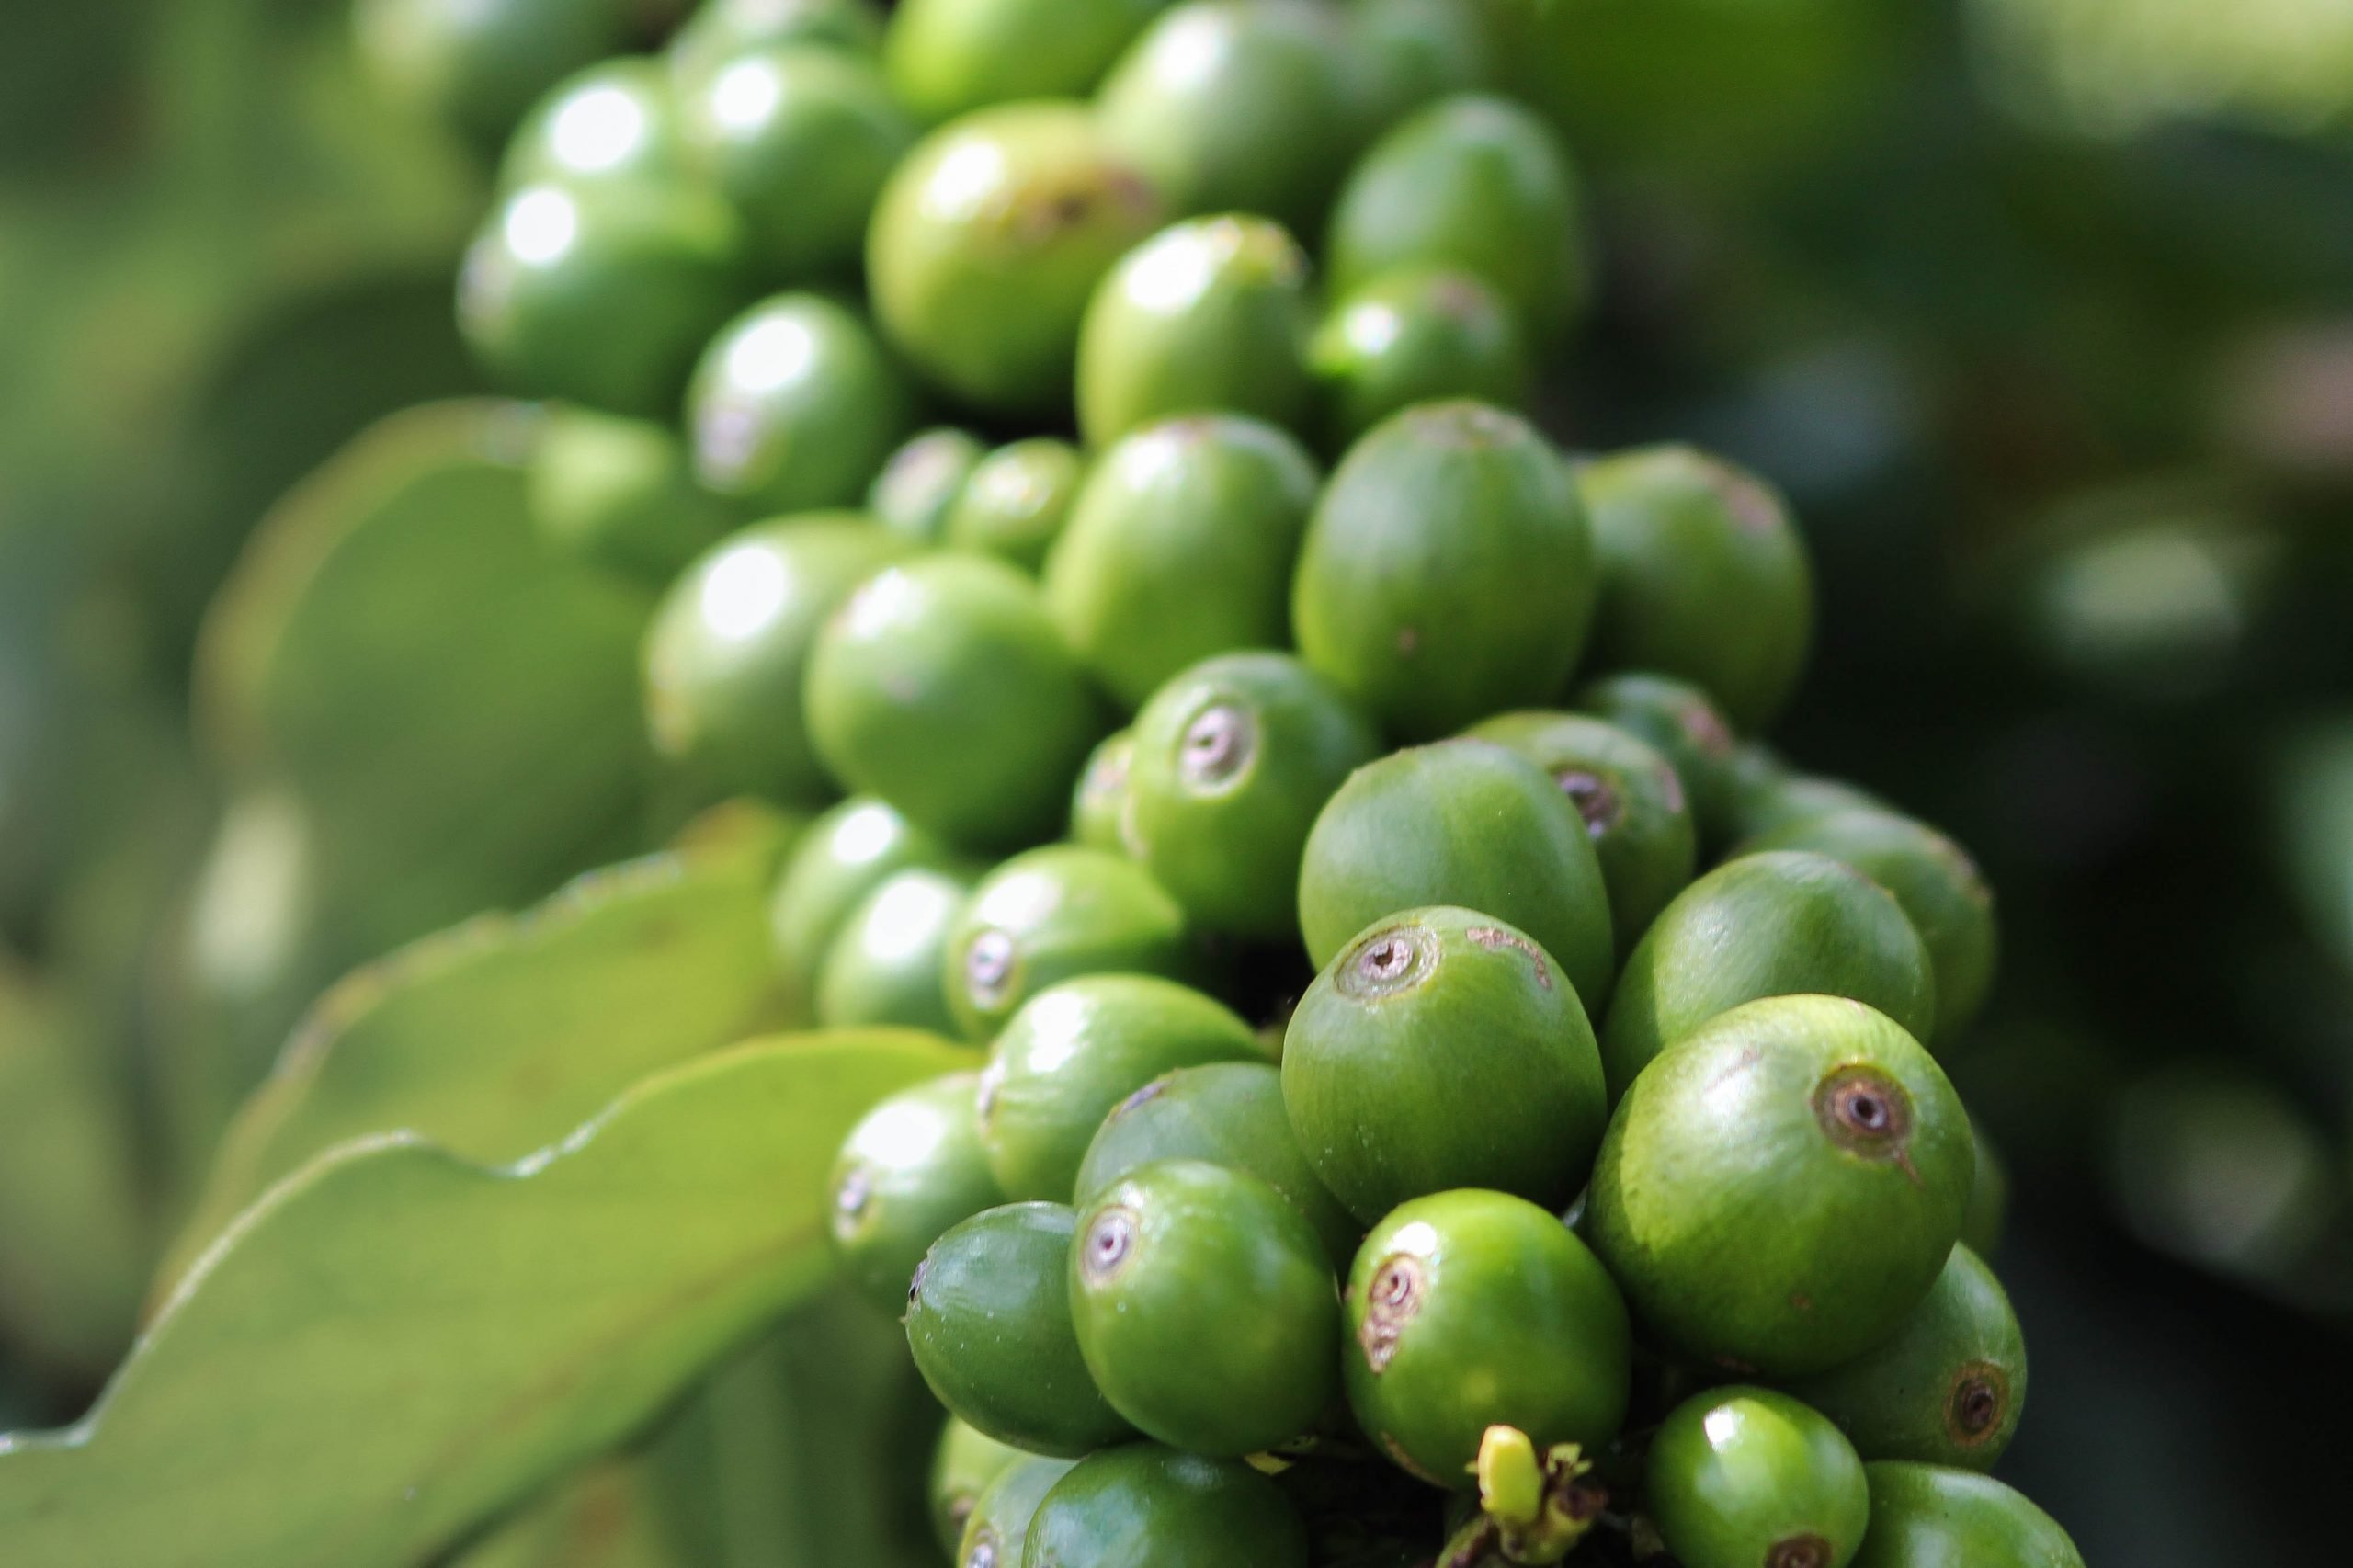 Maui coffee grower takes home top honors